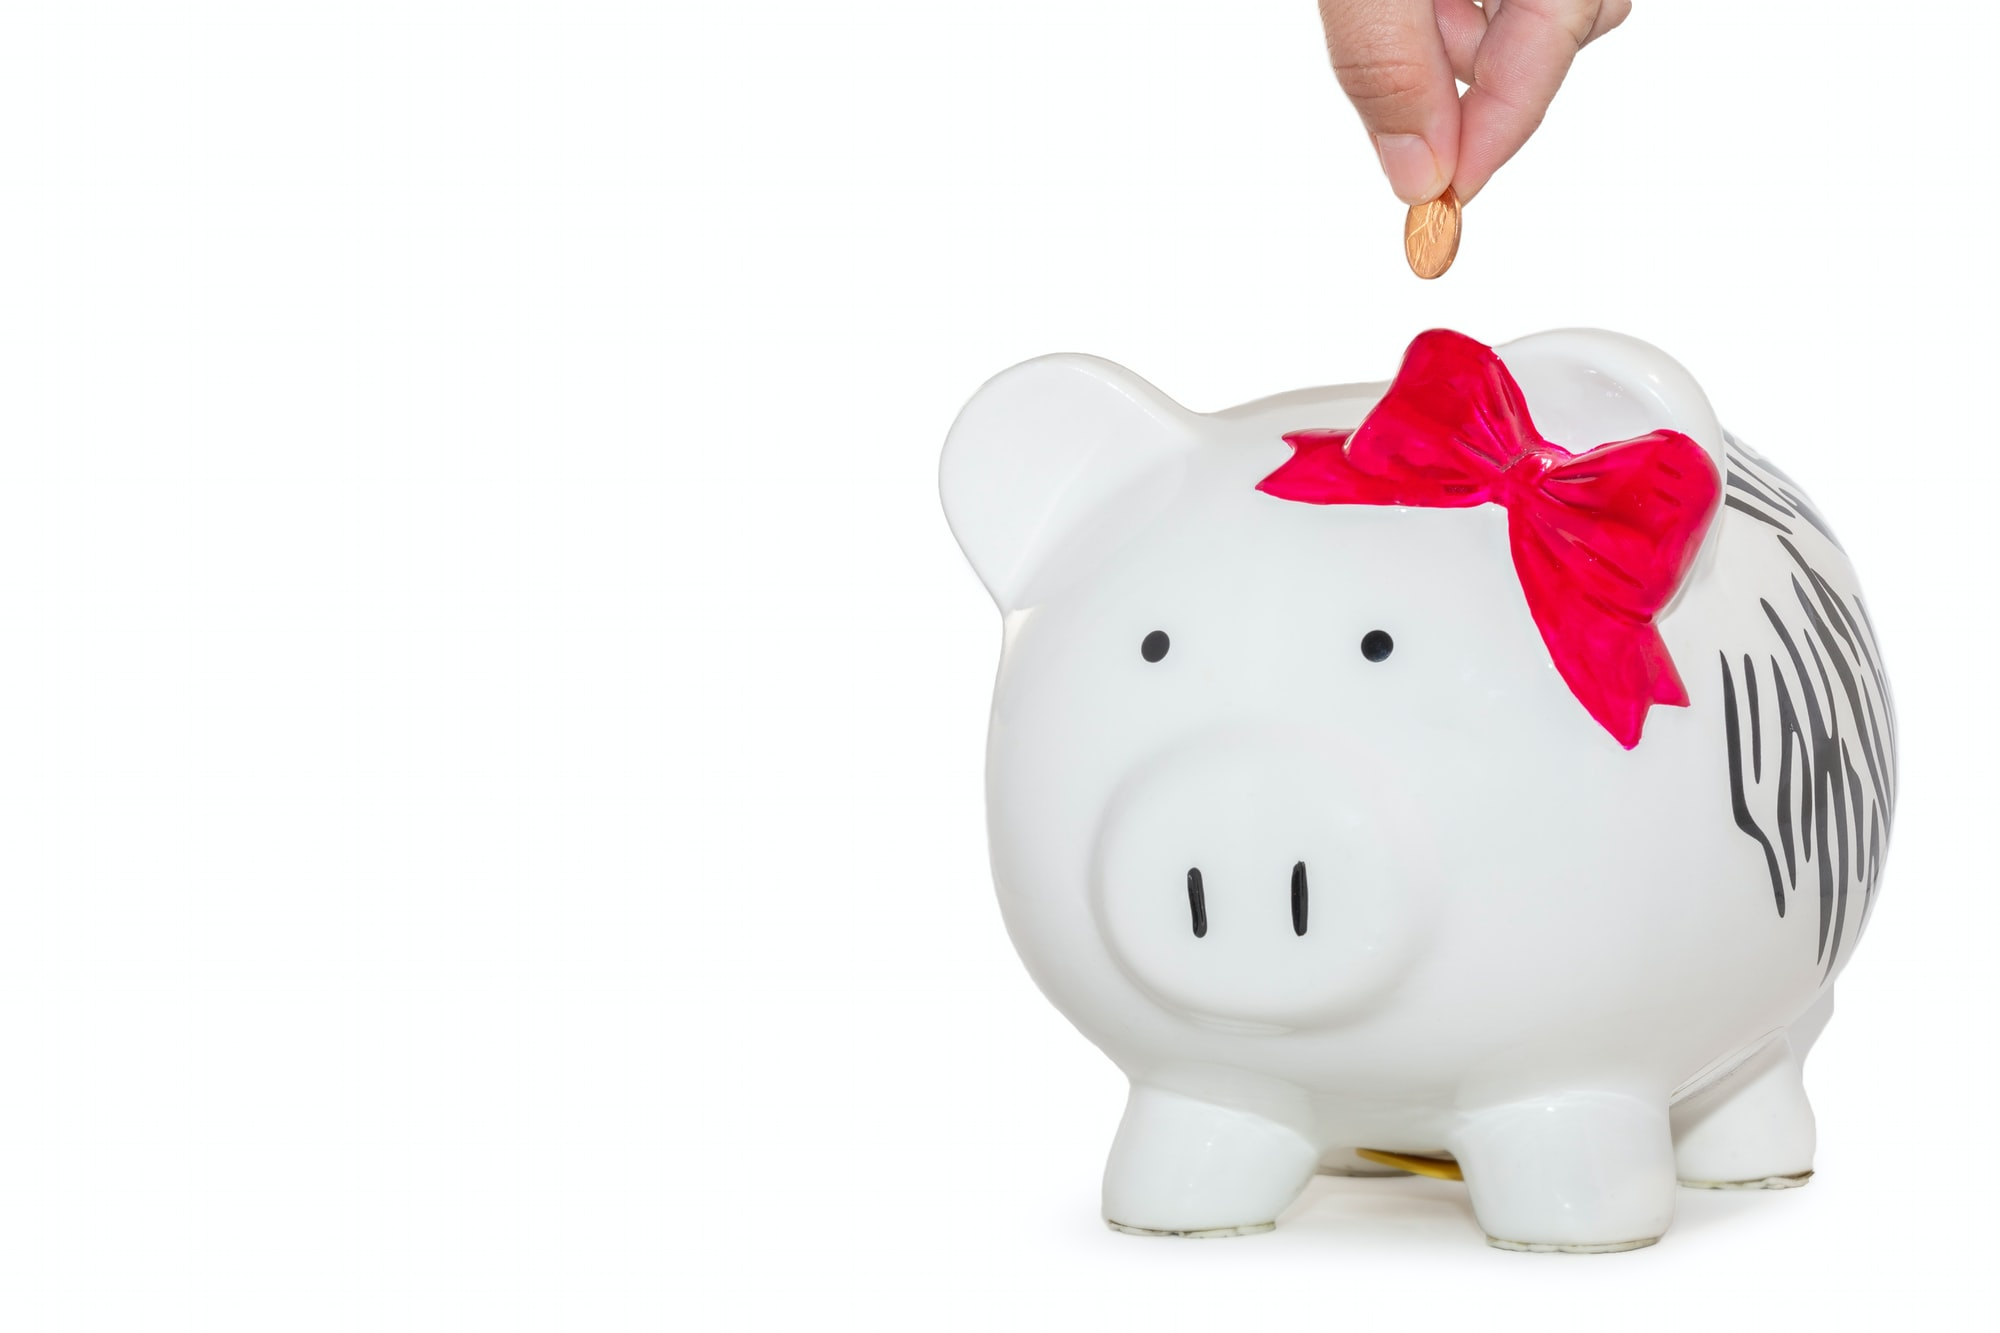 Saving money with a piggy bank